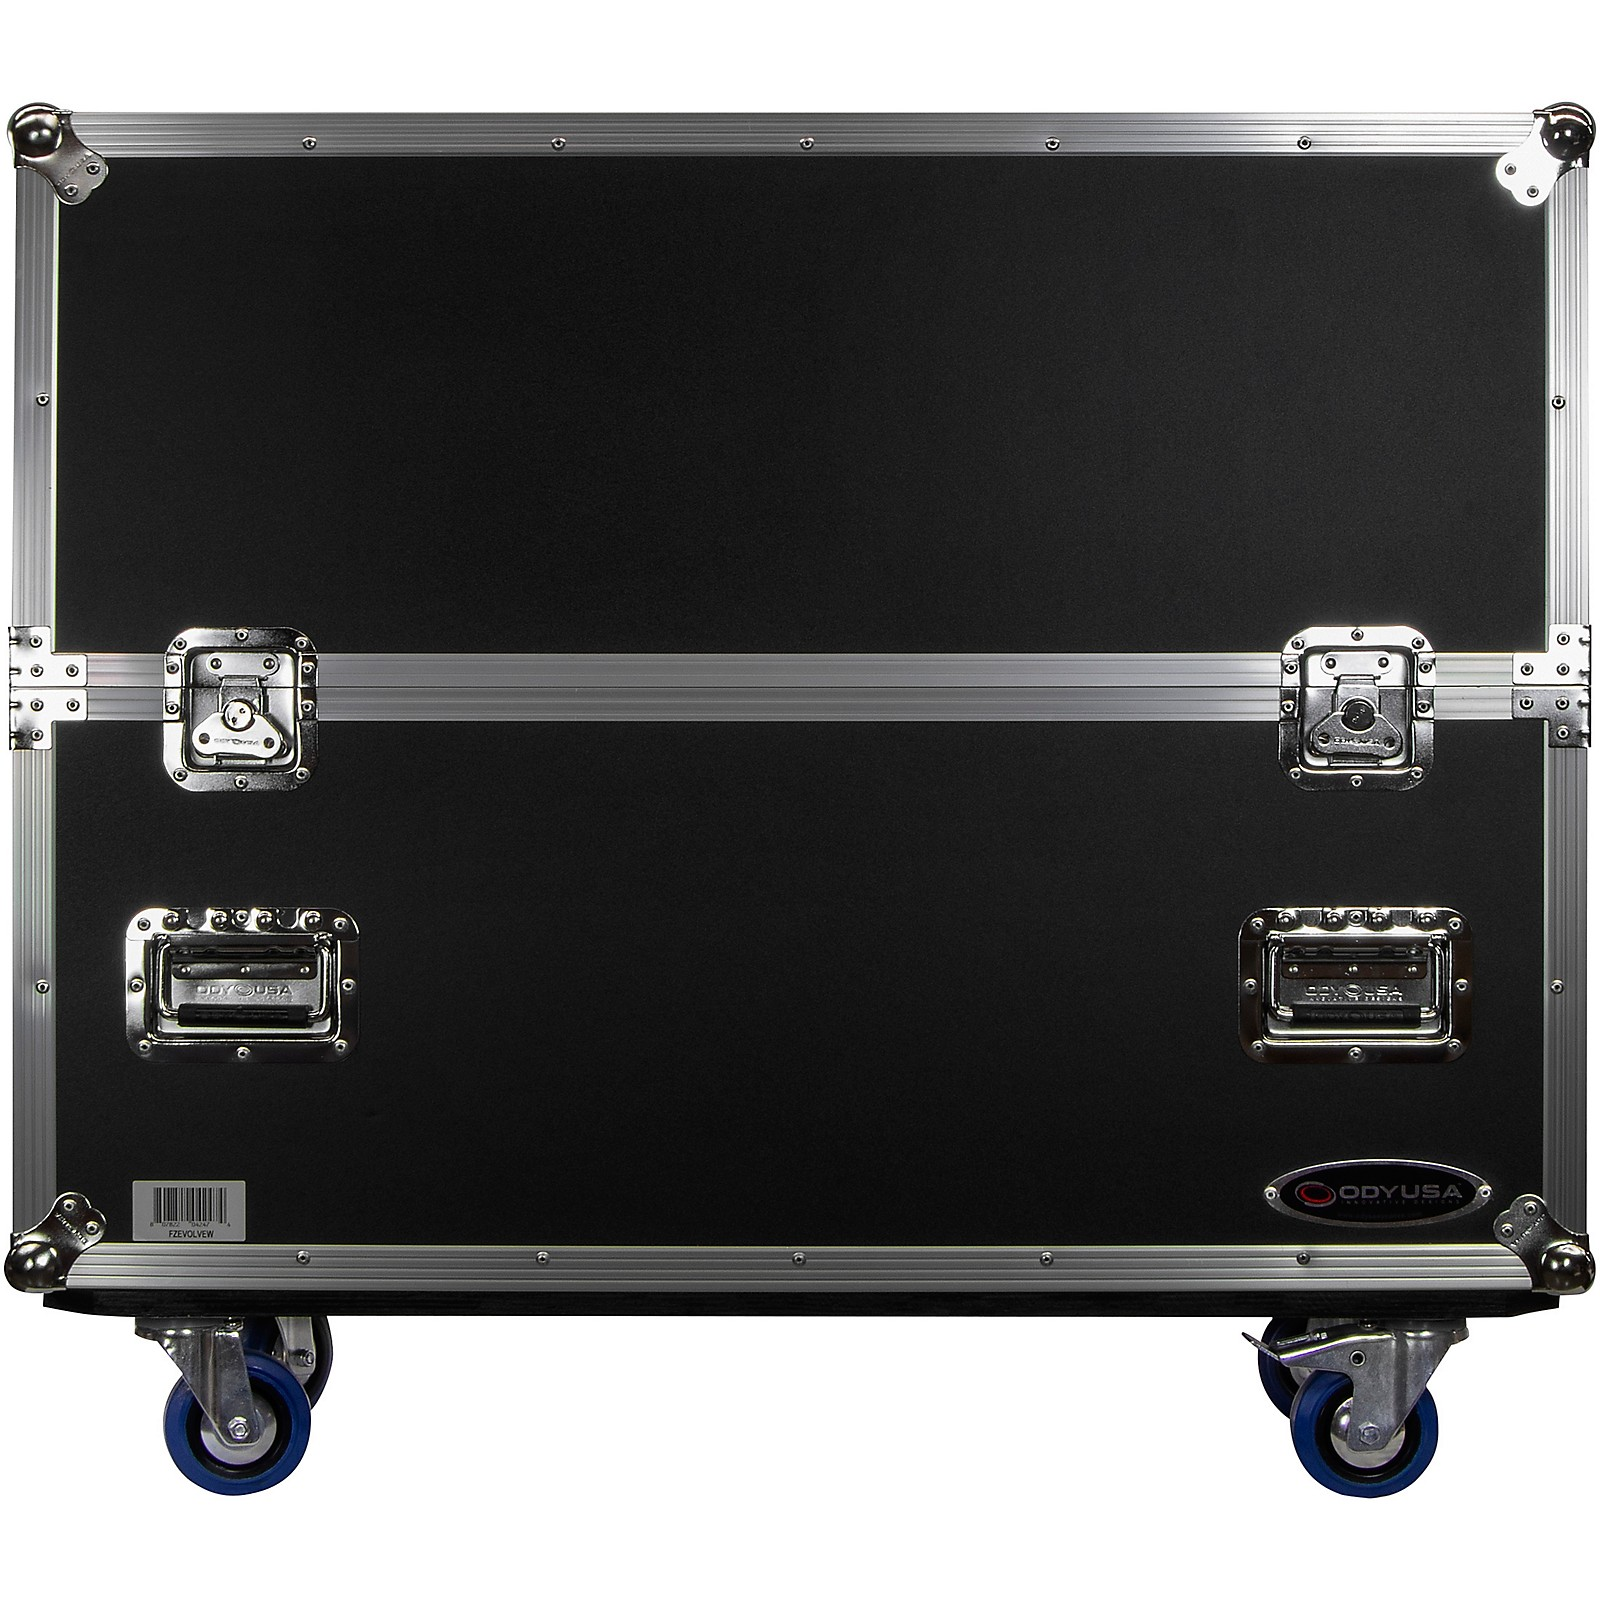 Open Box Odyssey FZEVOLVEW Electro-Voice EVOLVE 50 Portable Column System Case with Wheels